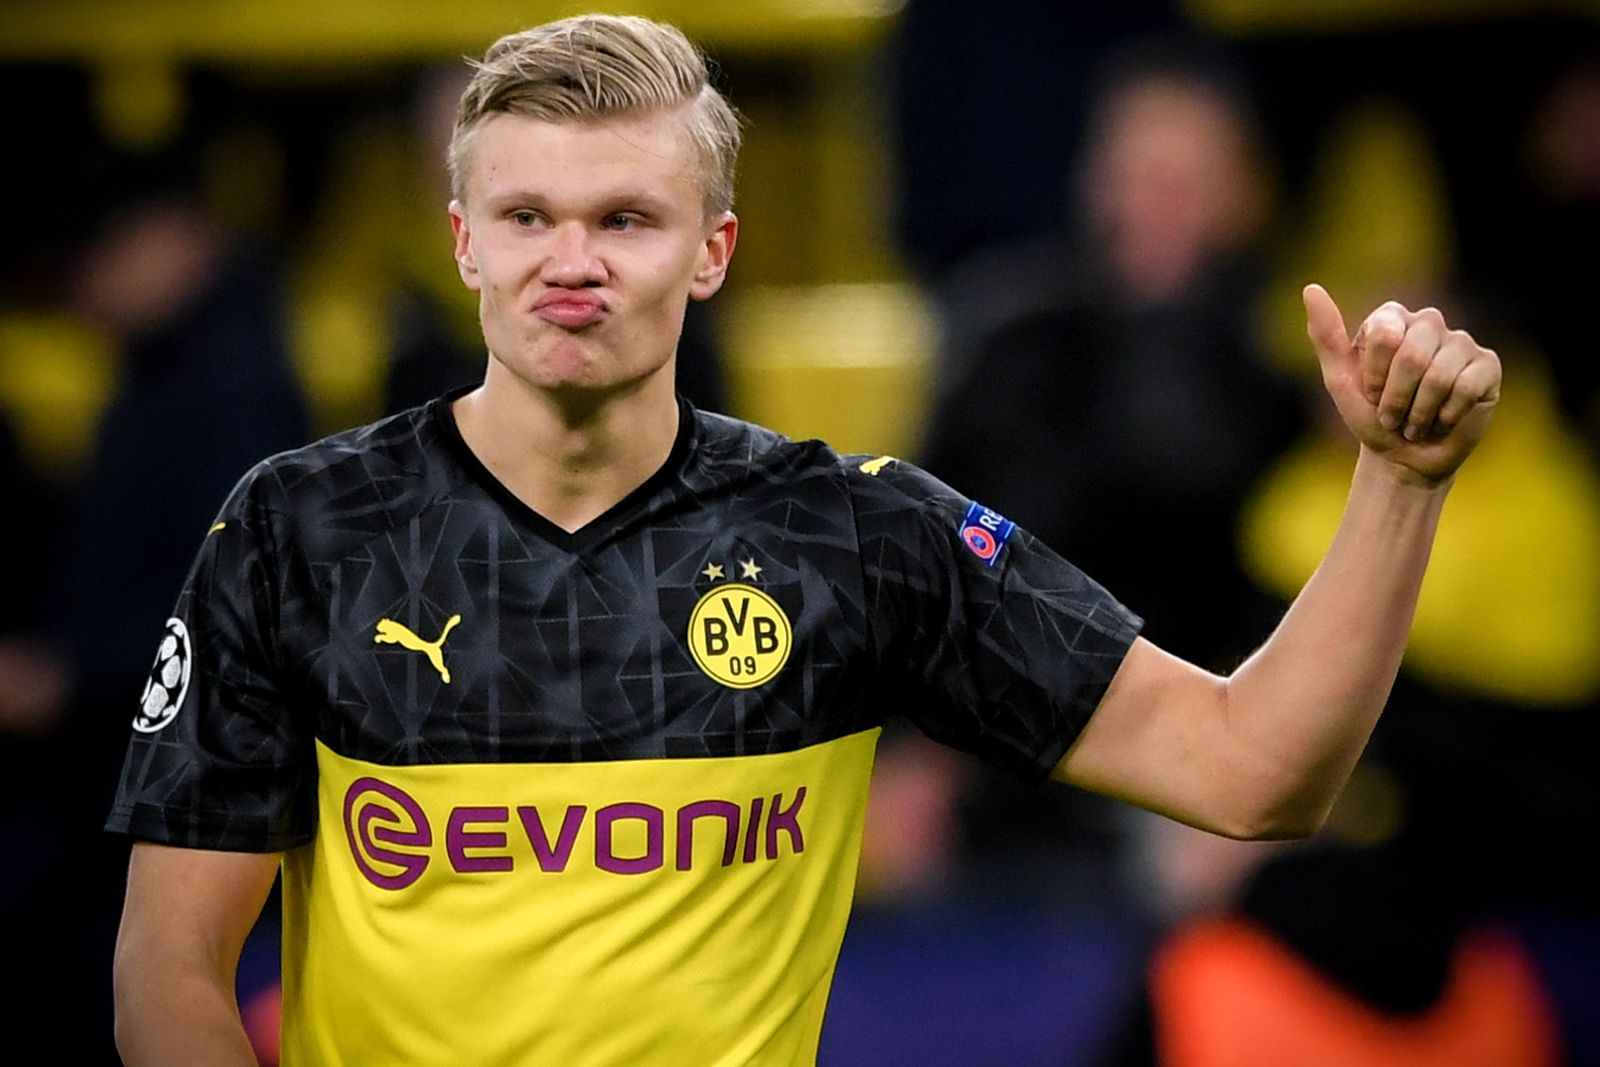 Borussia Dortmund vs Paris Saint-Germain, Germany - 18 Feb 2020